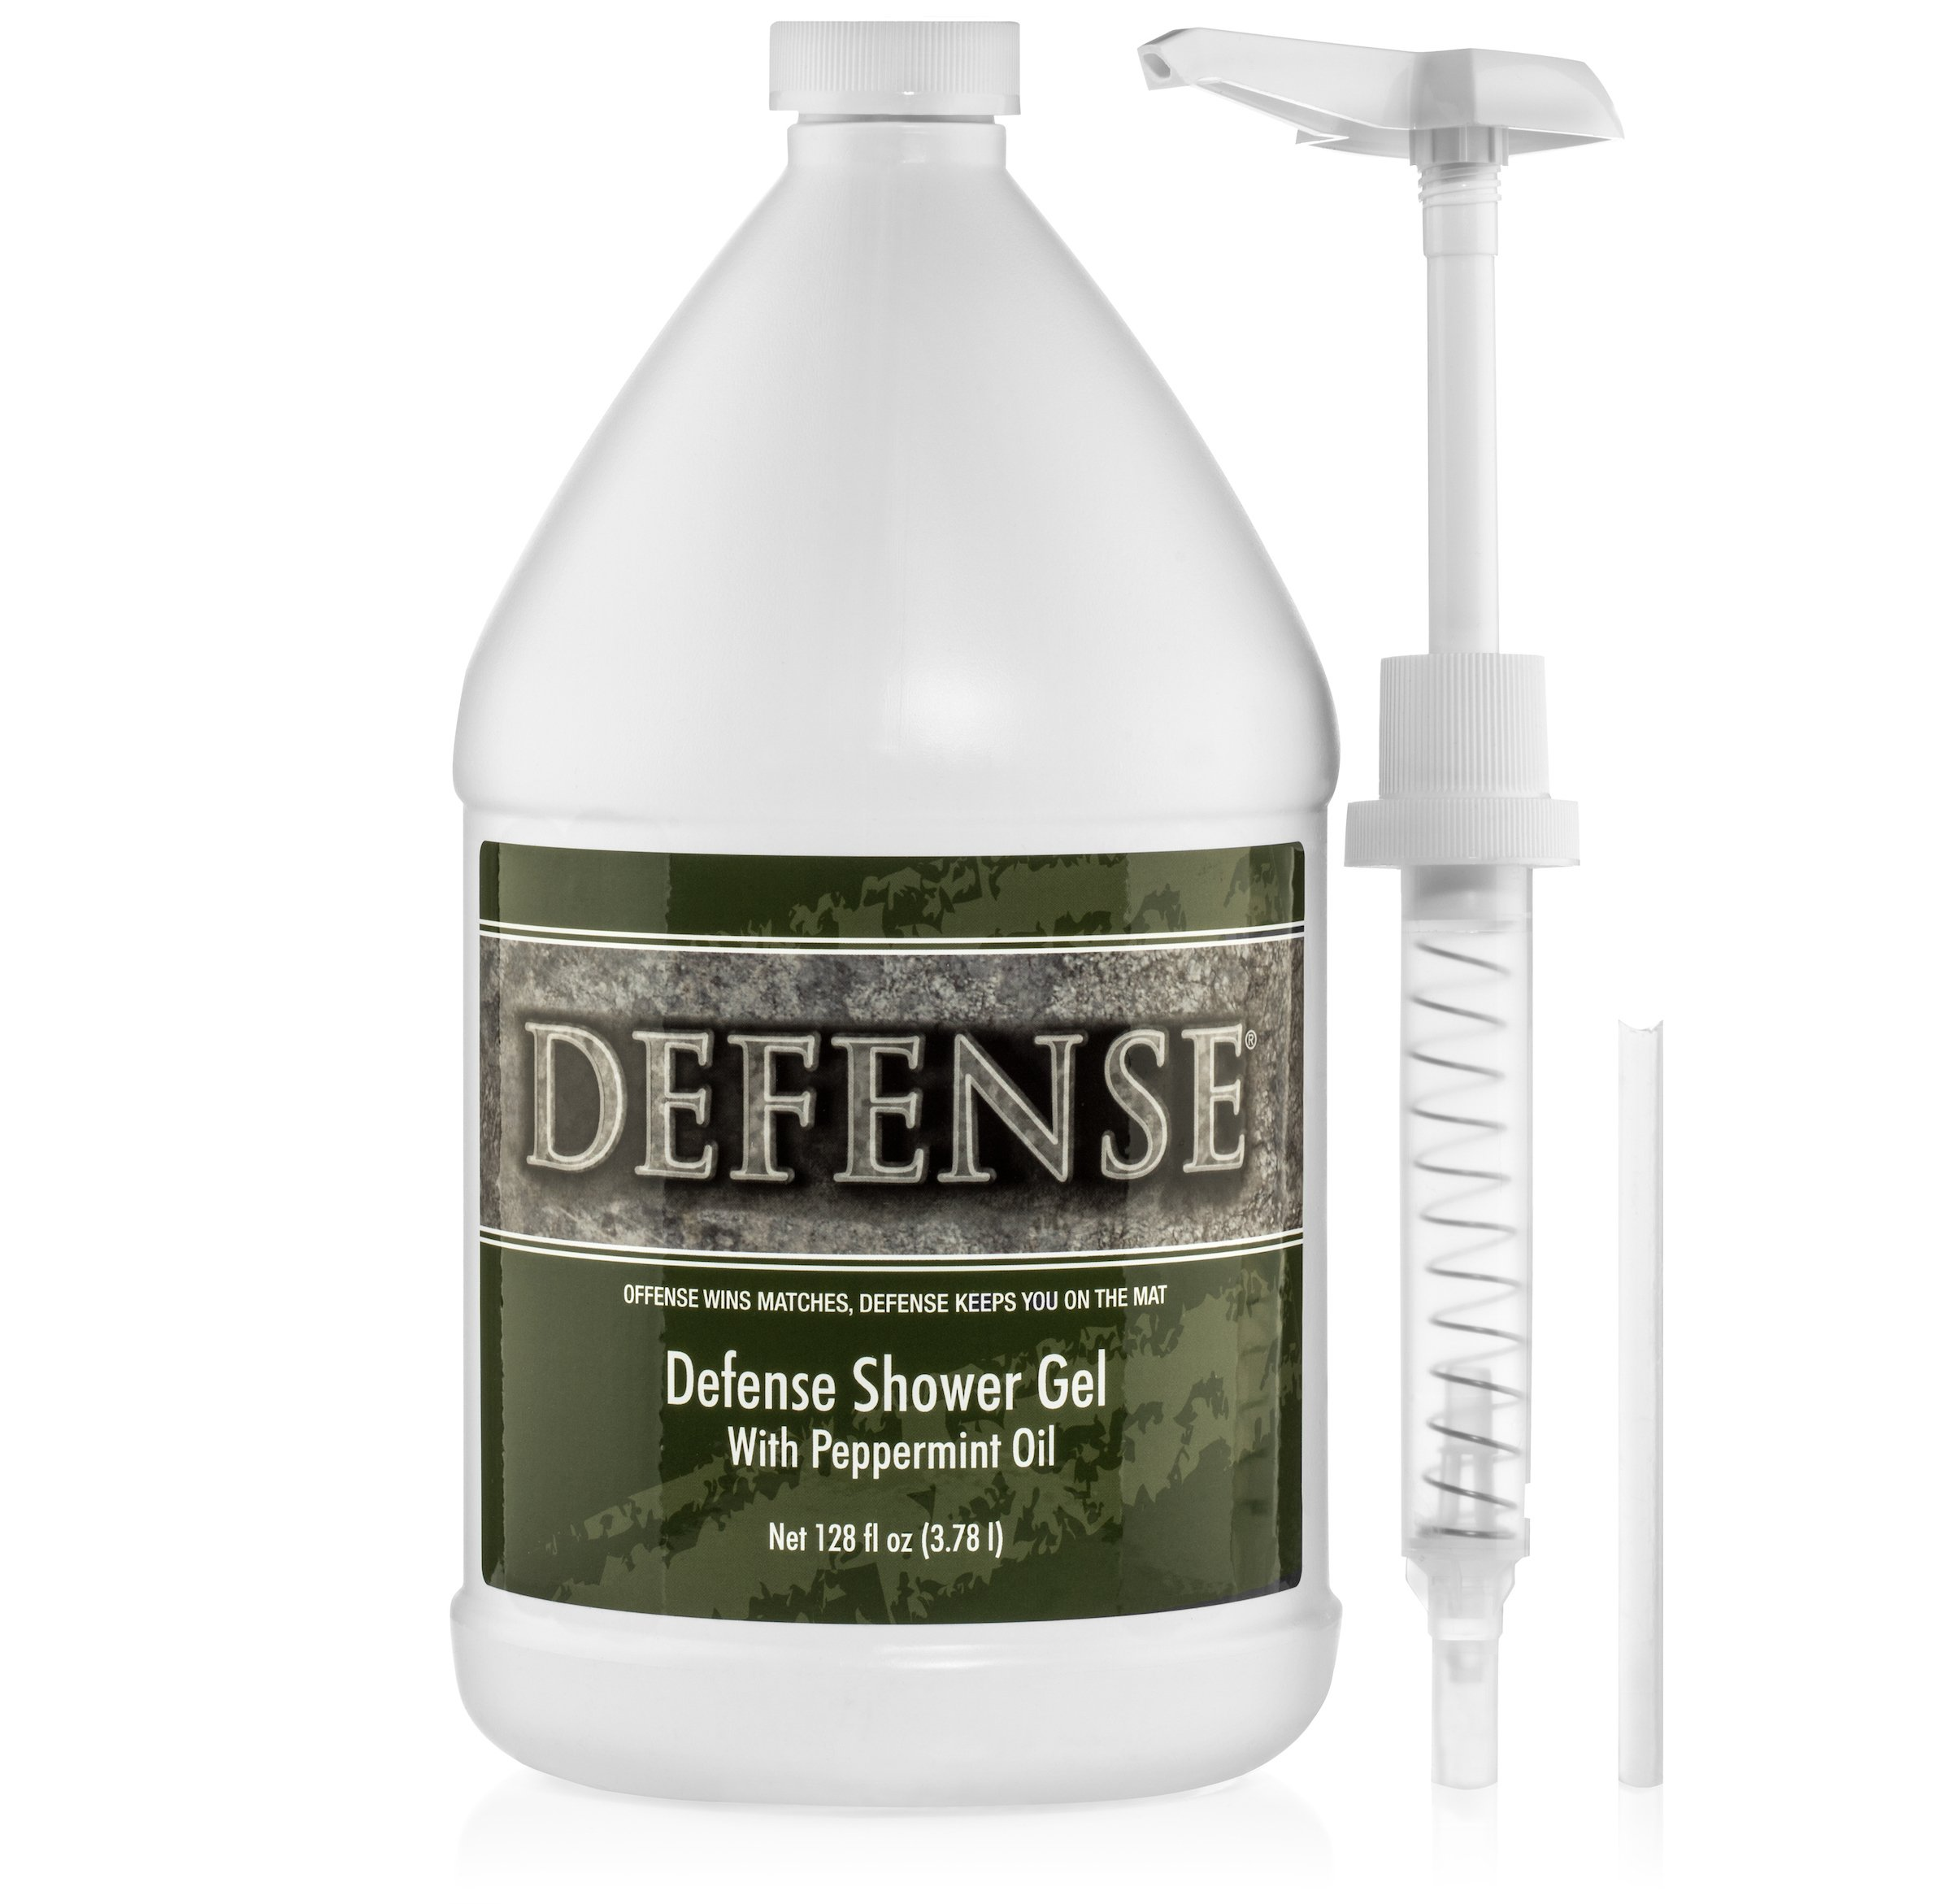 Defense Soap Peppermint Body Wash Shower Gel 1 Gallon (128 Fl Oz) by Defense Soap